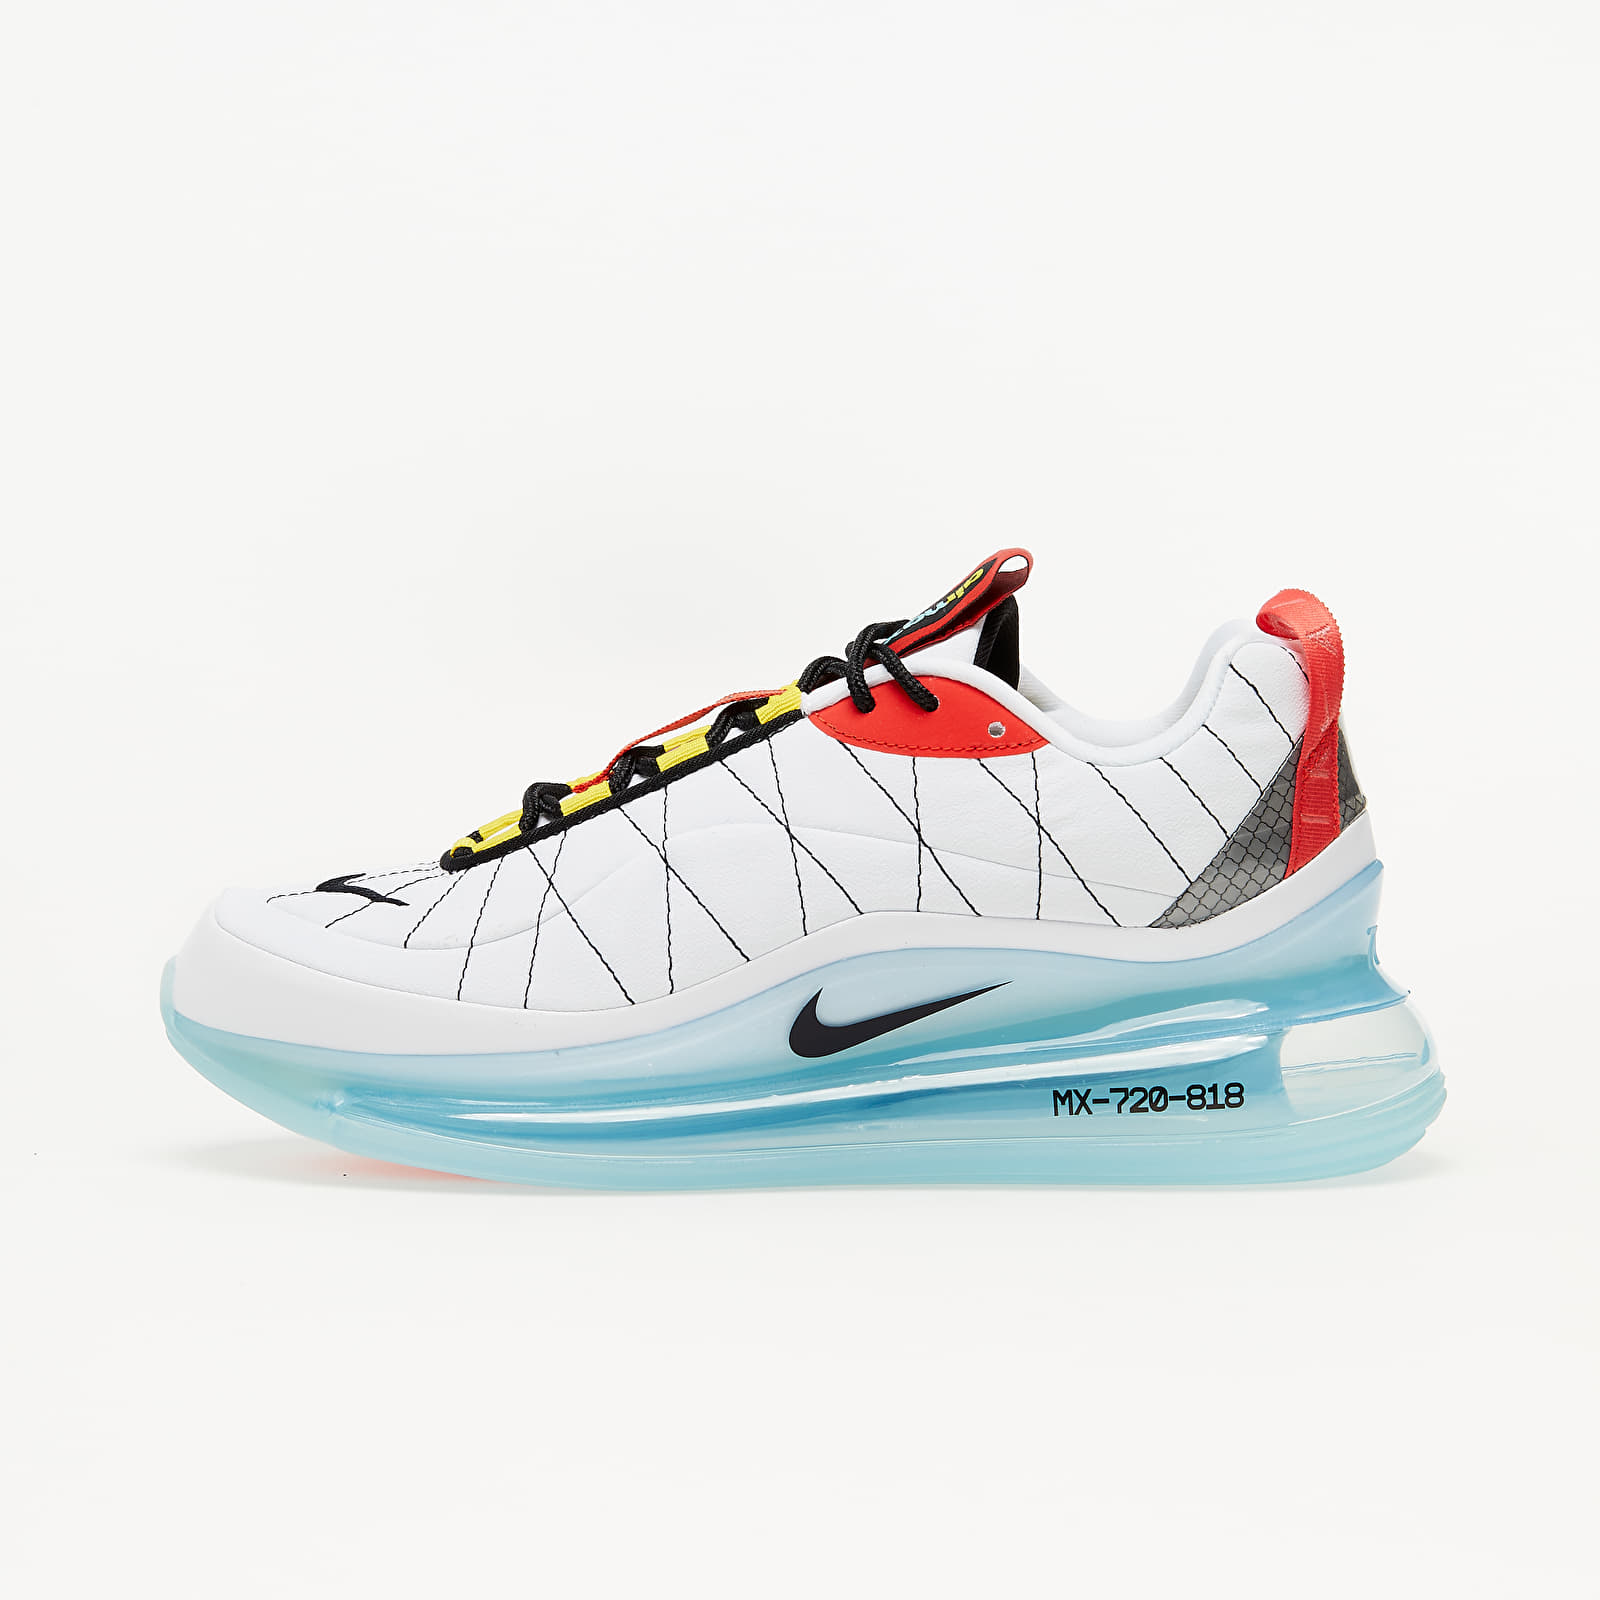 Nike MX-720-818 White/ Black-Speed Yellow-Chile Red CV4199-100